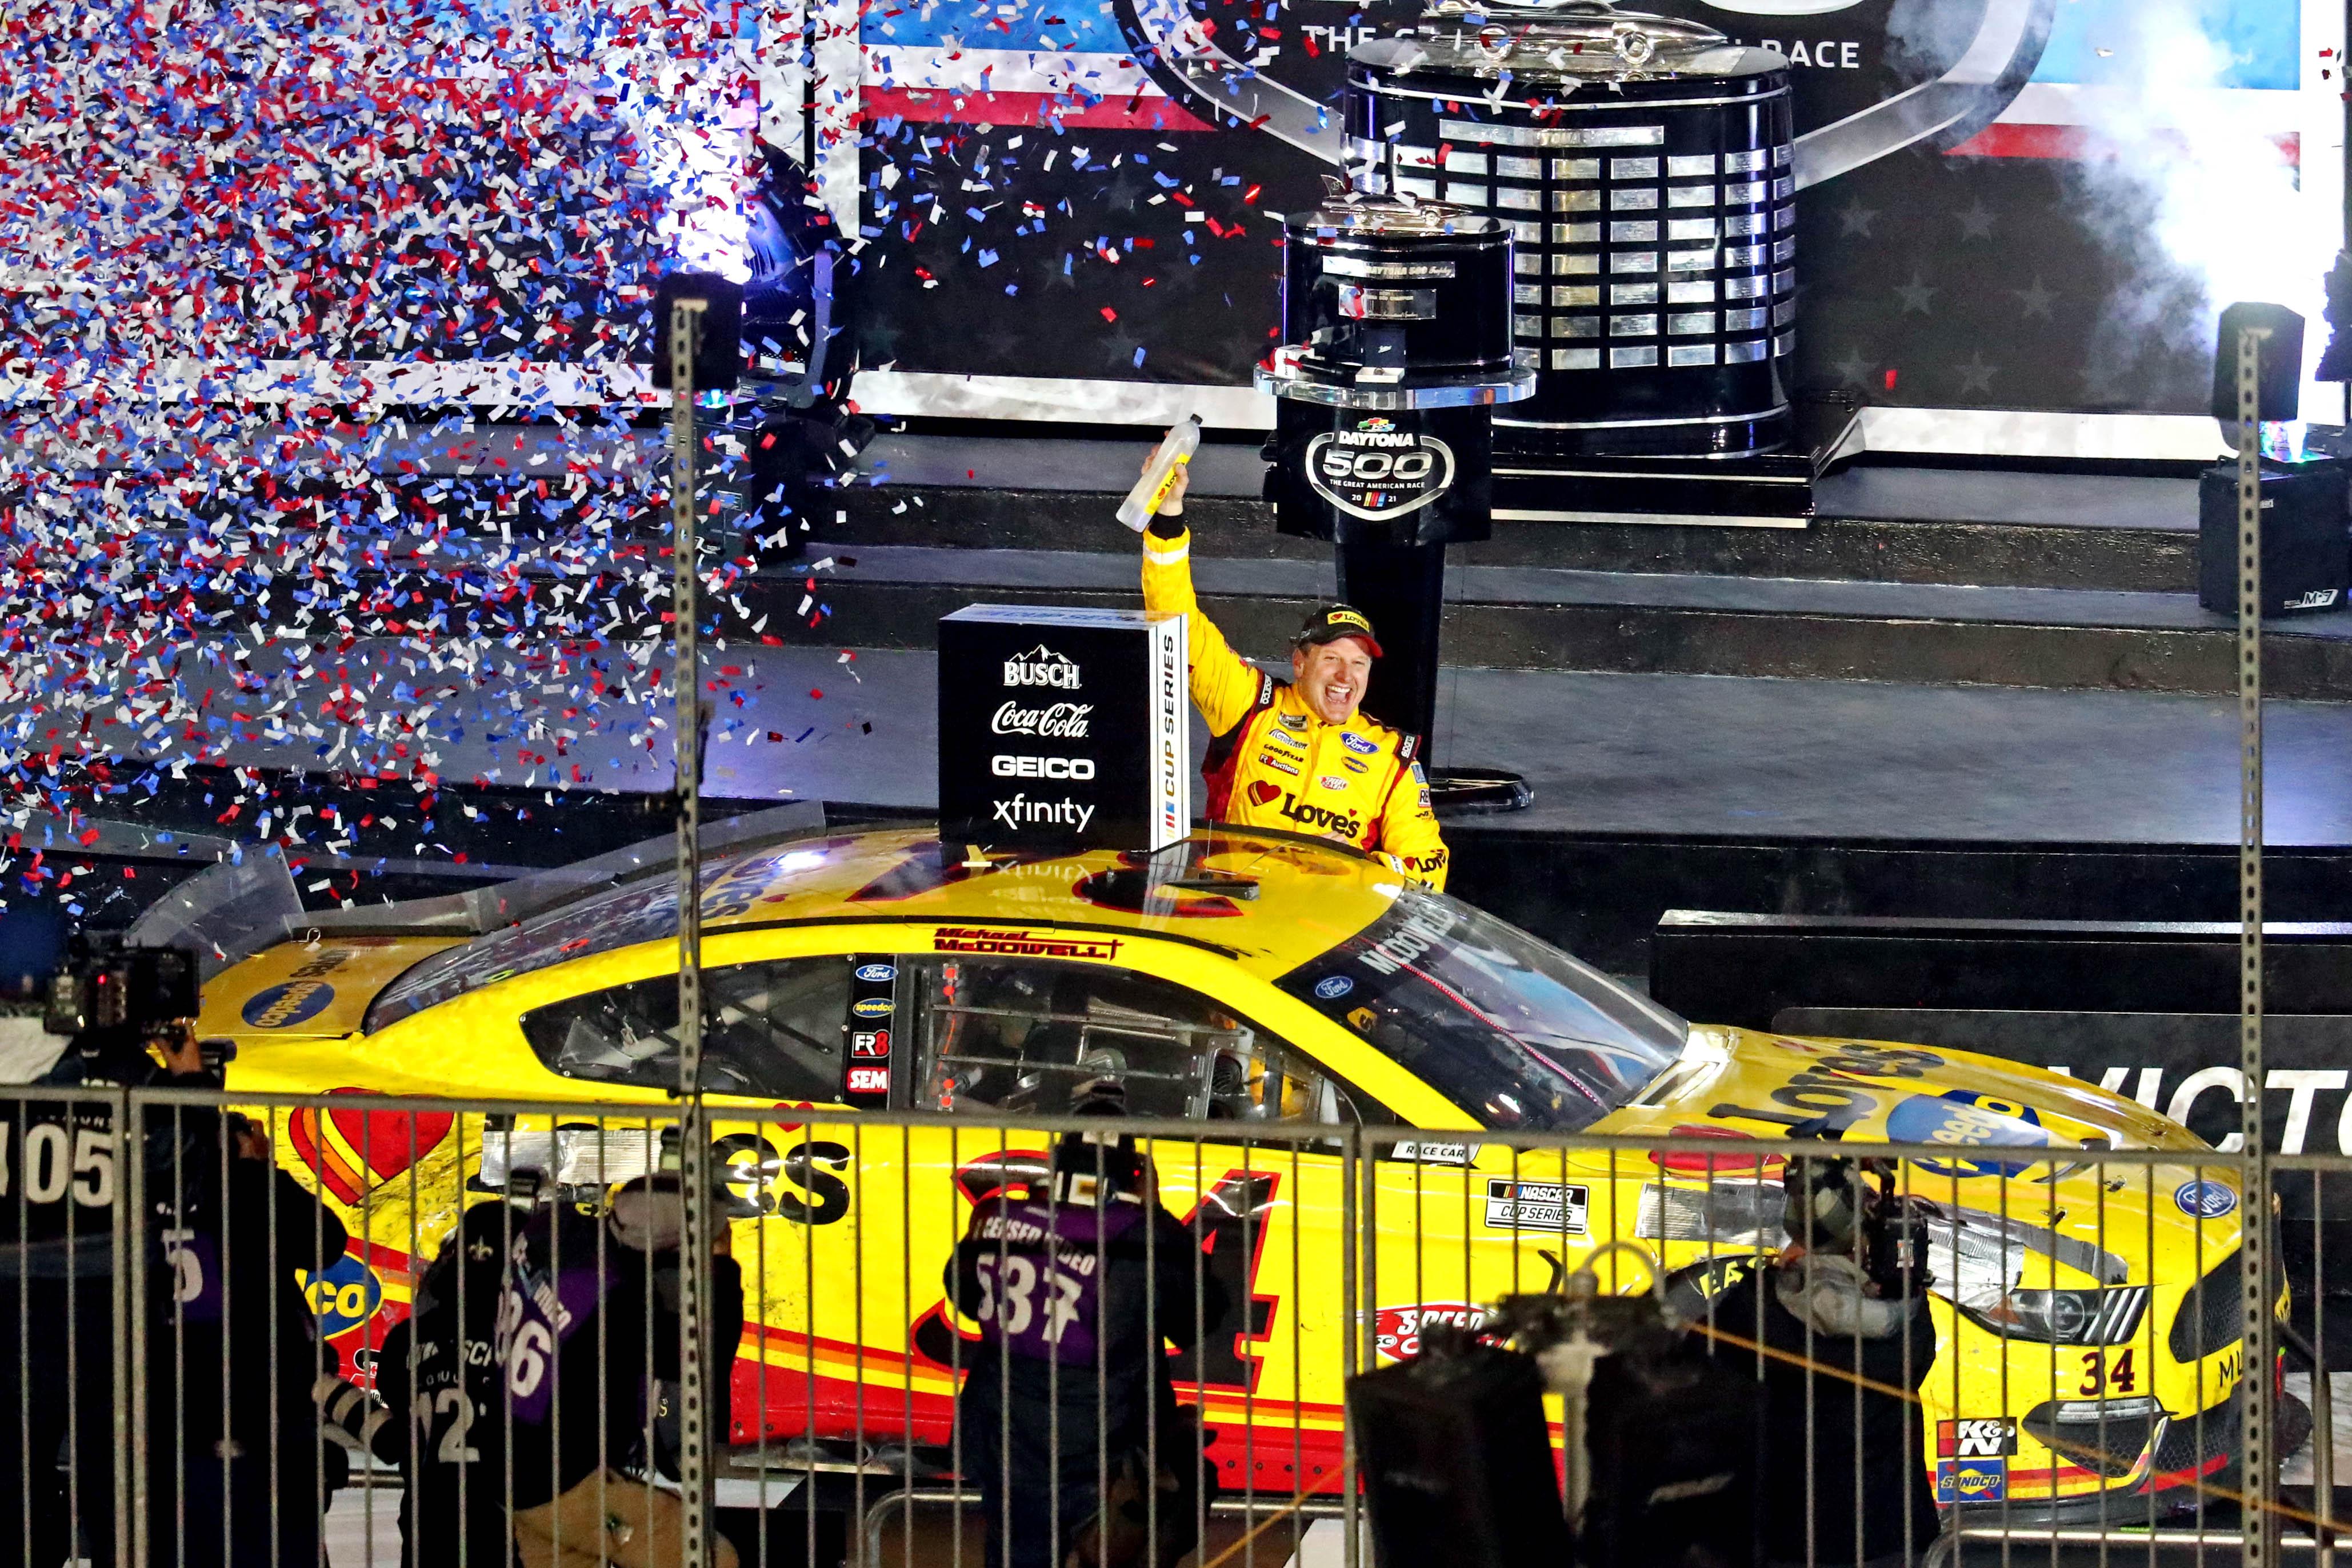 Feb 14, 2021; Daytona Beach, Florida, USA; NASCAR Cup Series driver Michael McDowell (34) celebrates winning the Daytona 500 at Daytona International Speedway. Mark J. Rebilas-USA TODAY Sports